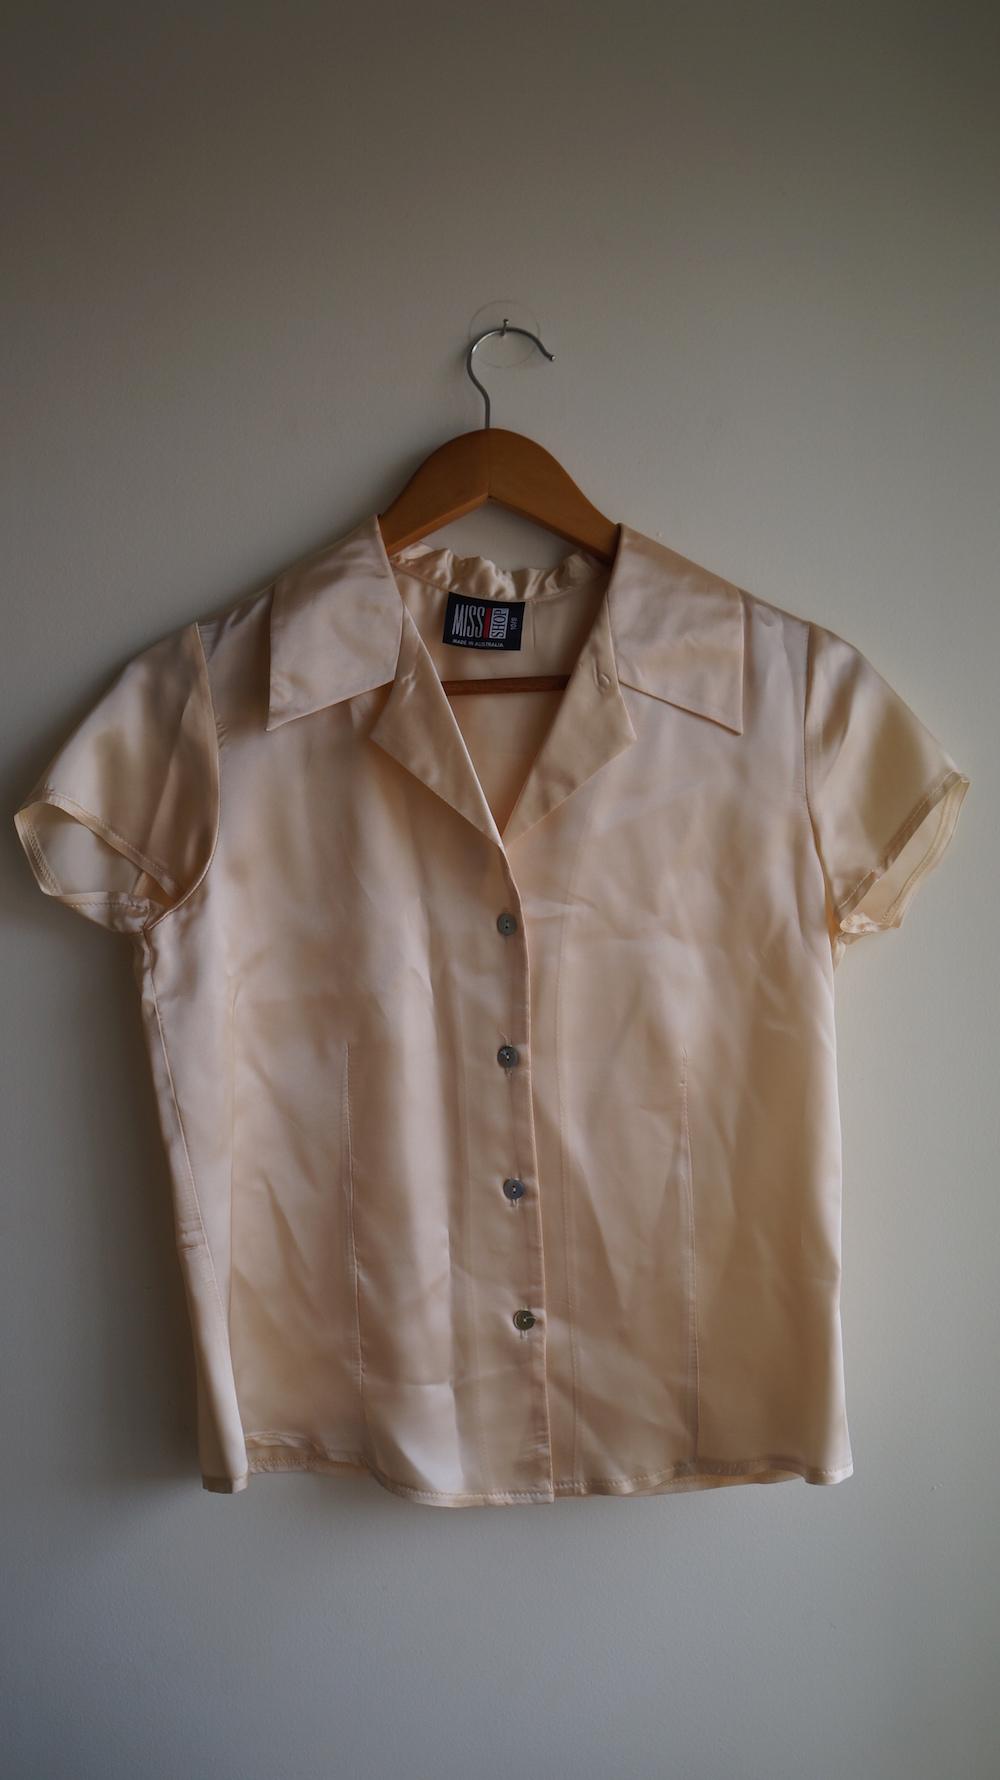 b90d3ad87731f1 Miss Shop Silk Peach Cream Ivory Short Sleeve Collared Button Down Shirt  Blouse Small